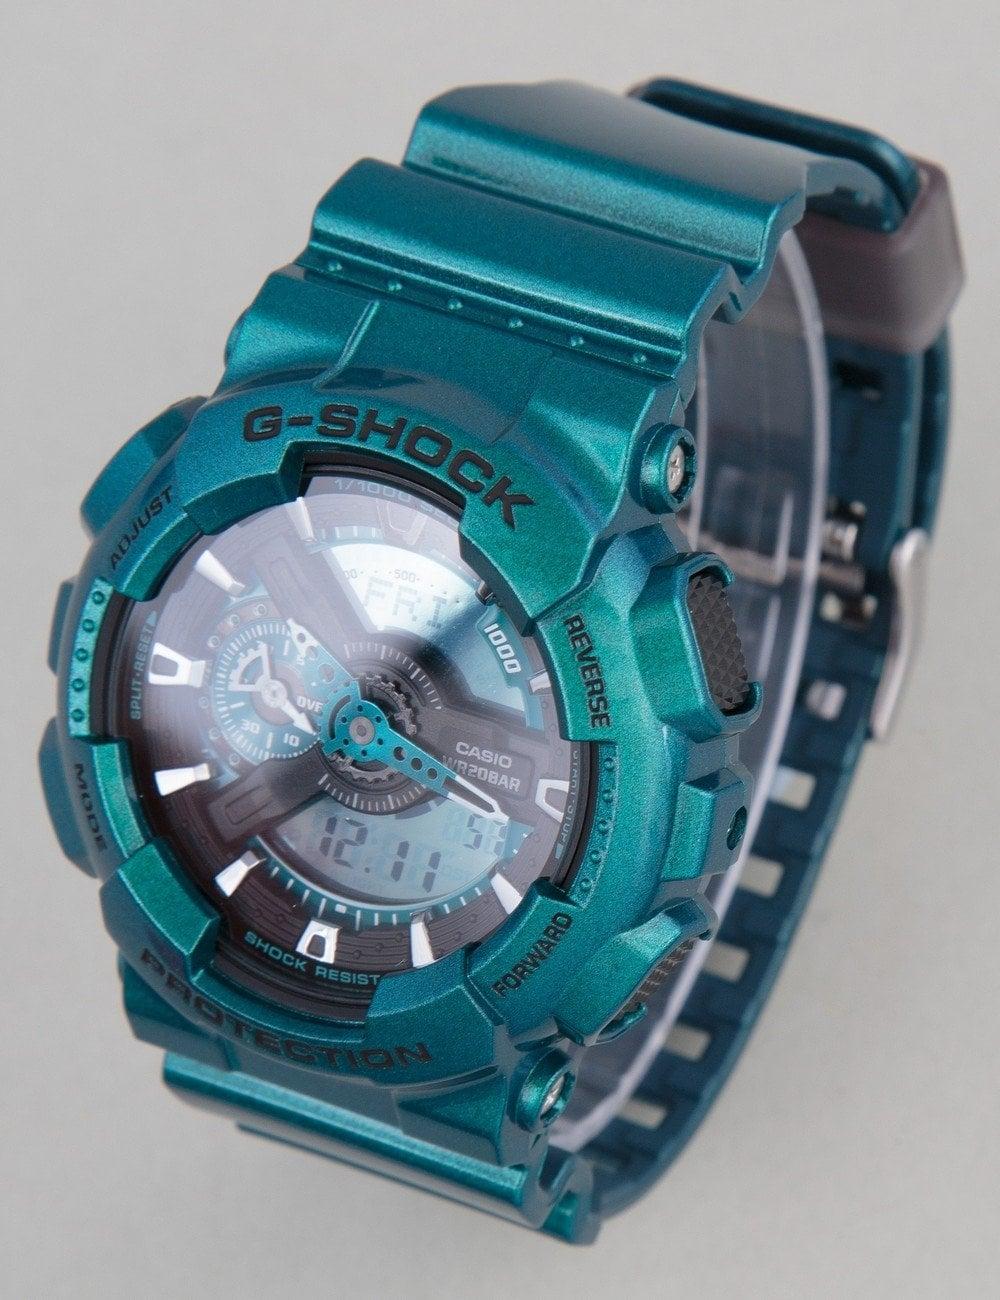 G Shock Green Casio Gshock Original Gd 100ms 3er Limited Colorway Ga 110nm 3aer Watch Accessories From Fat Buddha